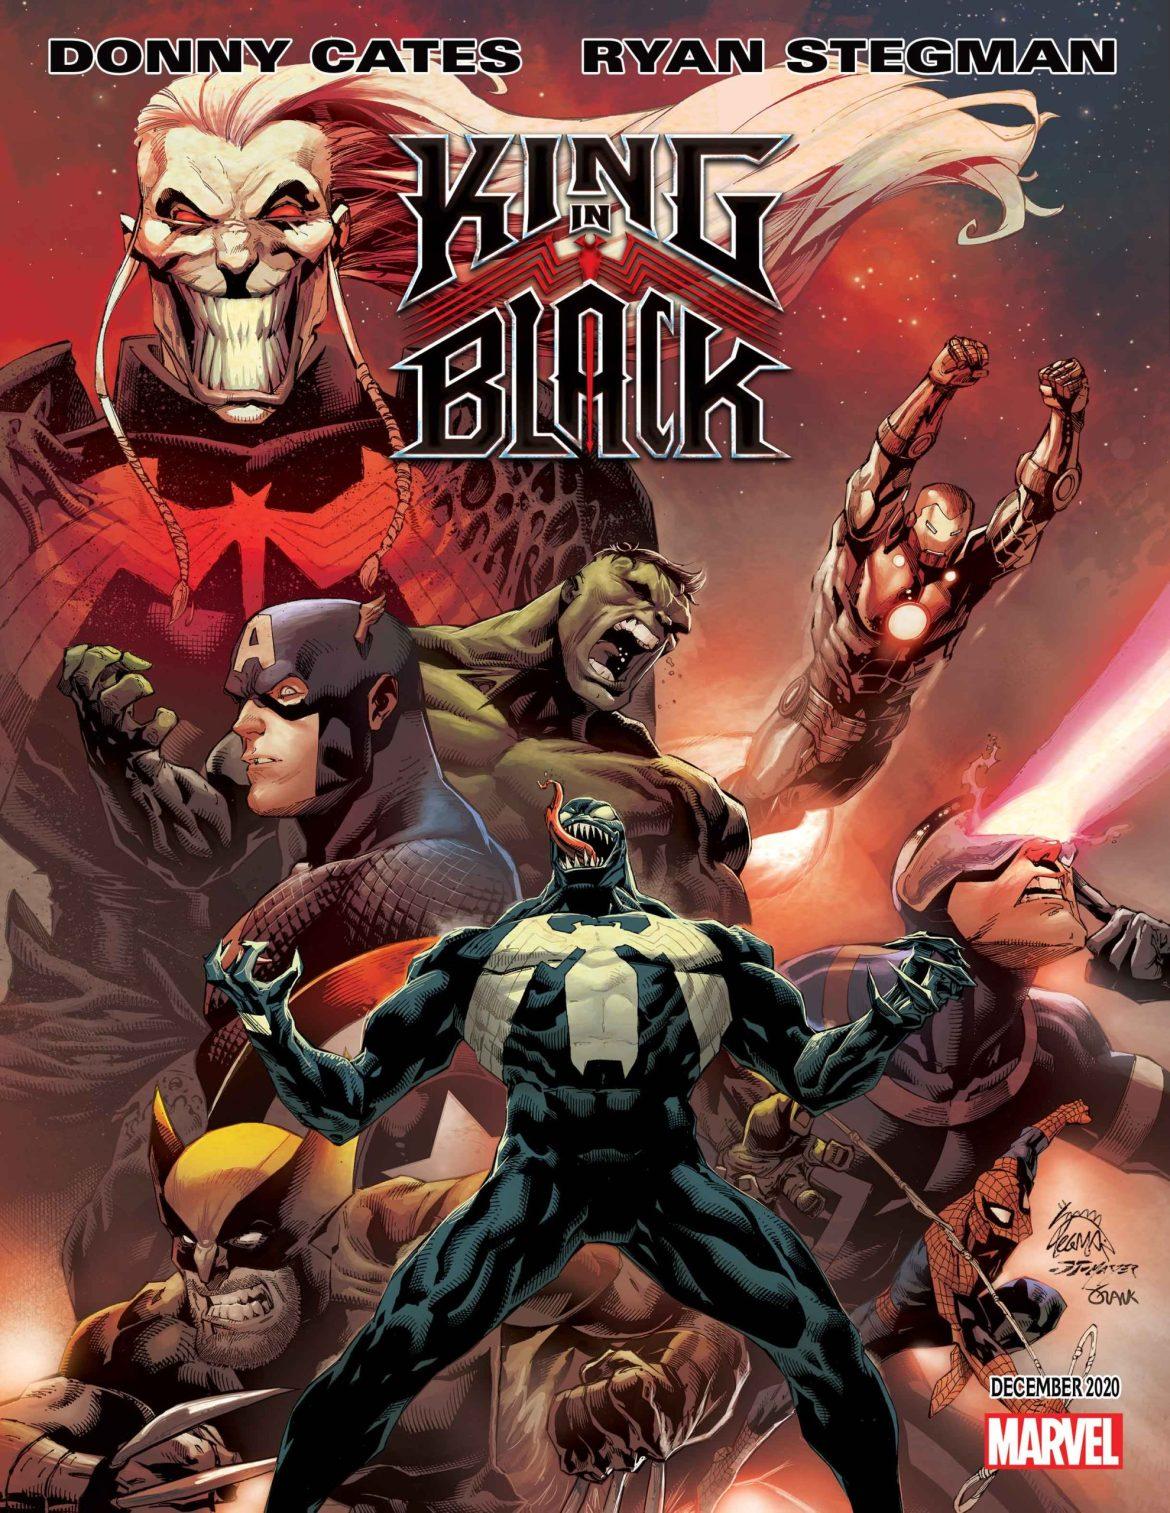 KING_IN_BLACK-scaled Donny Cates and Ryan Stegman's Venom saga continues in KING IN BLACK